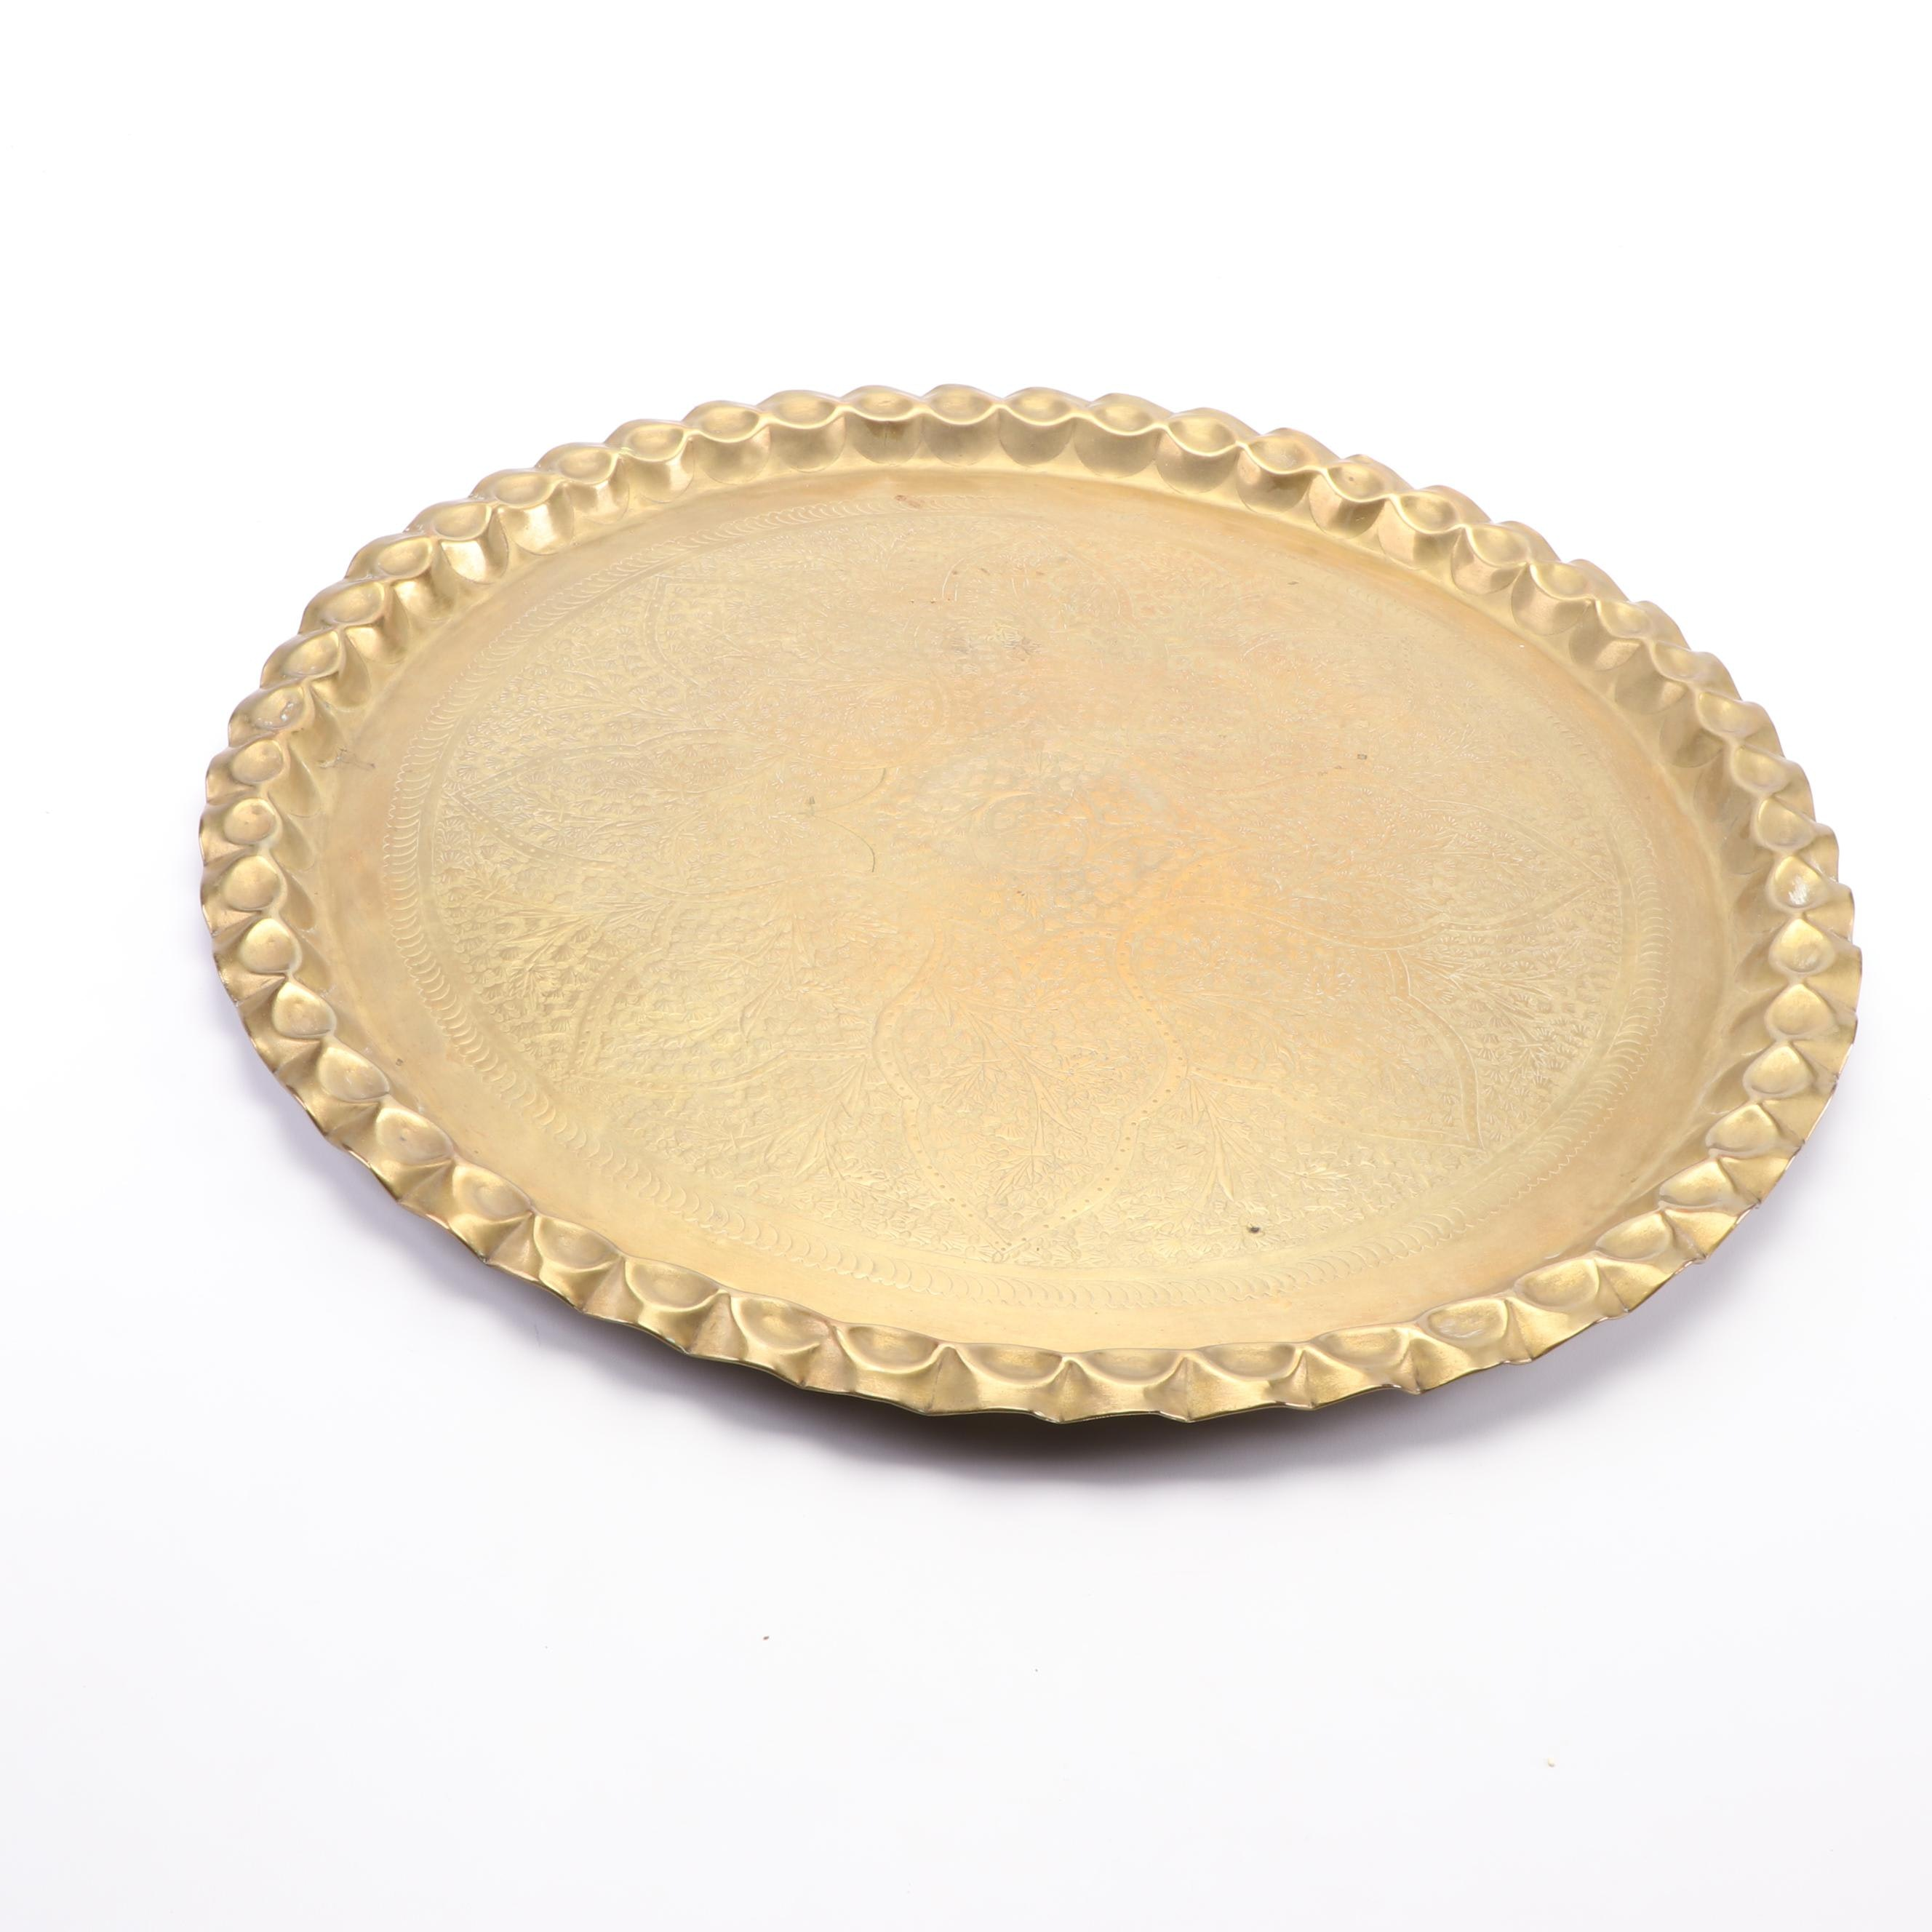 Brass Repoussé Turkish Style Tray